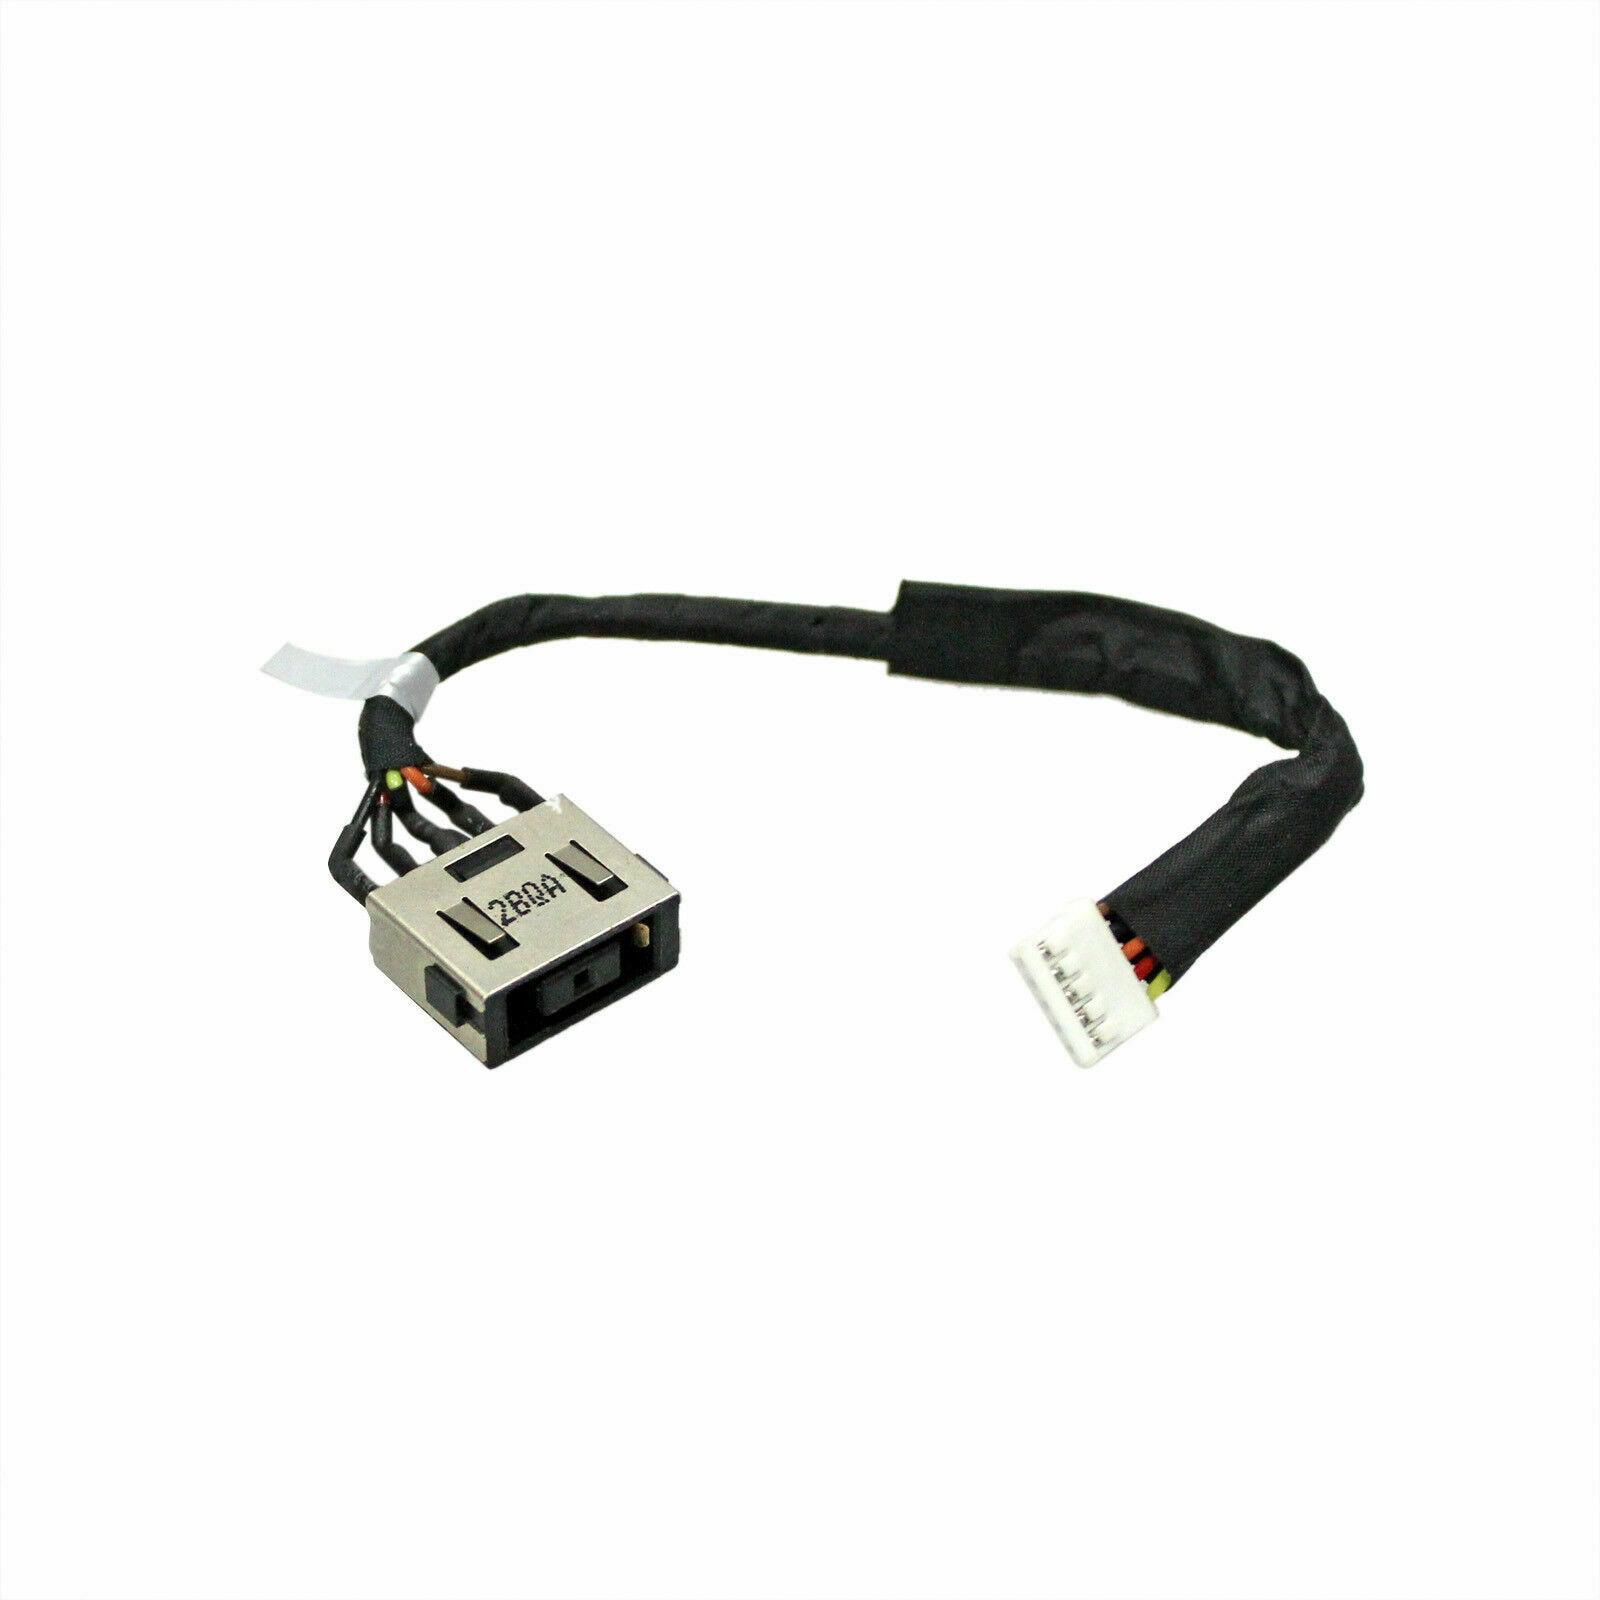 Cable de alimentación AC DC IN para Lenovo ThinkPad T440P puerto de carga de ordenador portátil